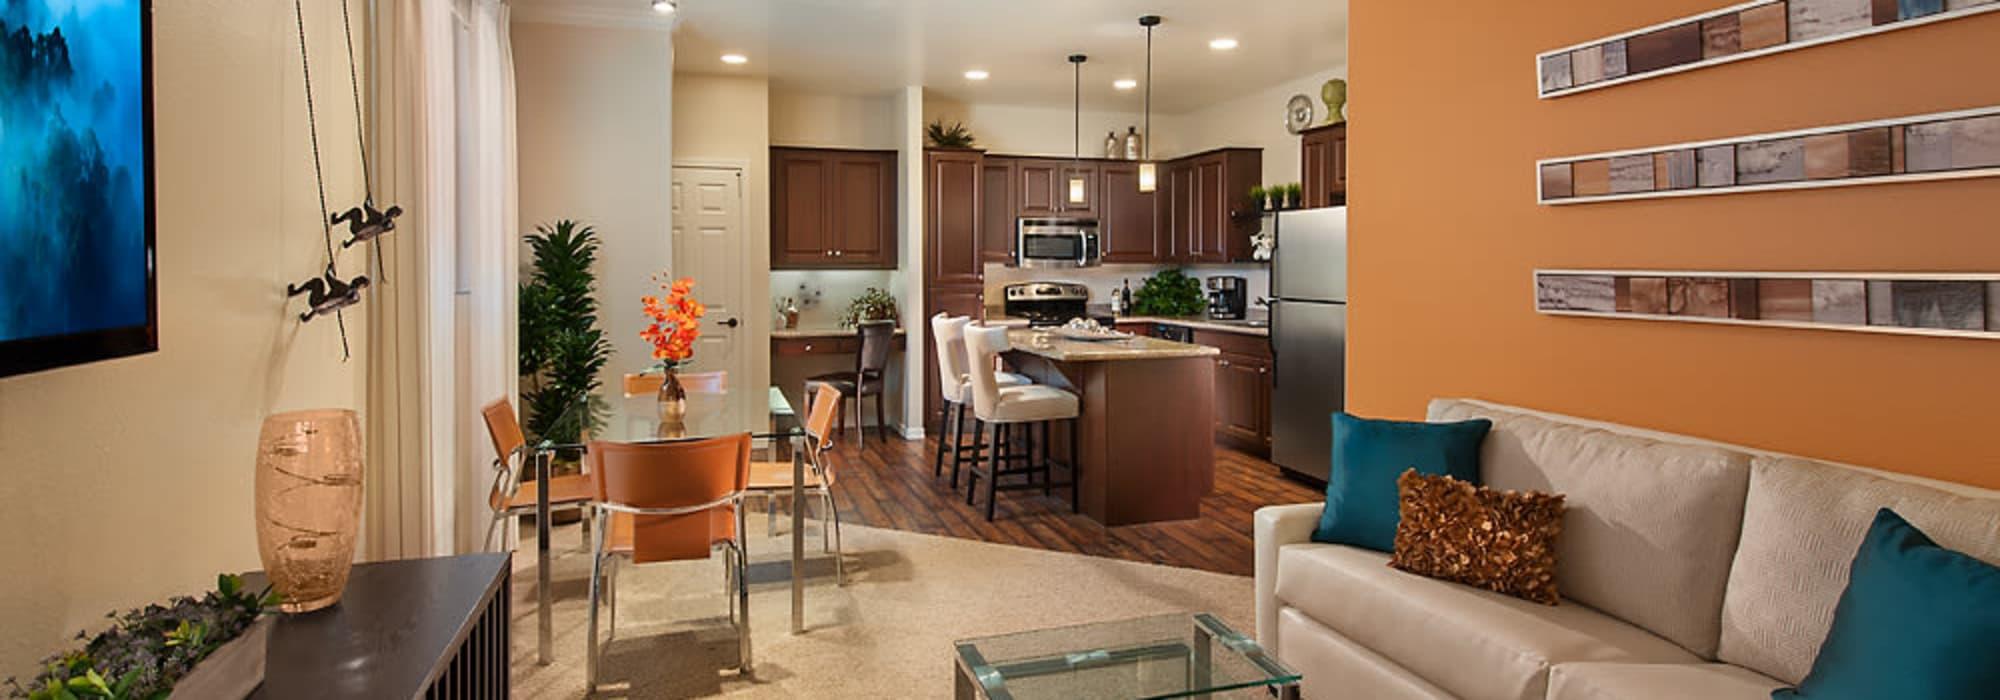 Luxury living room at San Norterra in Phoenix, Arizona